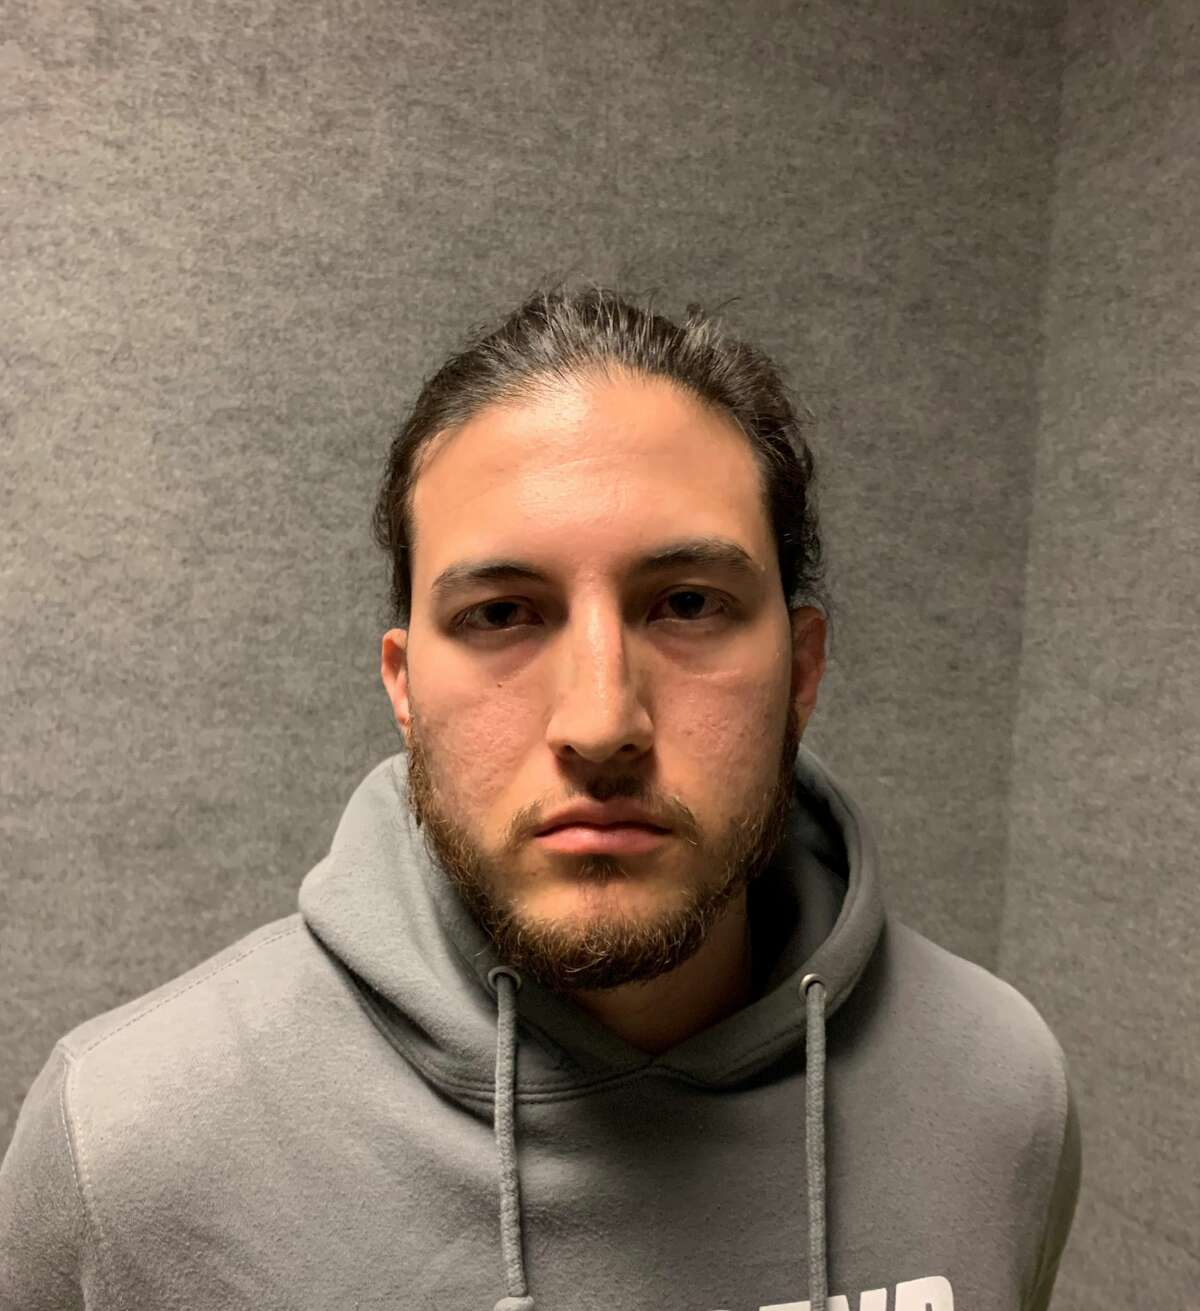 Joel Angel Zaragoza was arrested Tuesday in the death of Lisa Rosenstein.